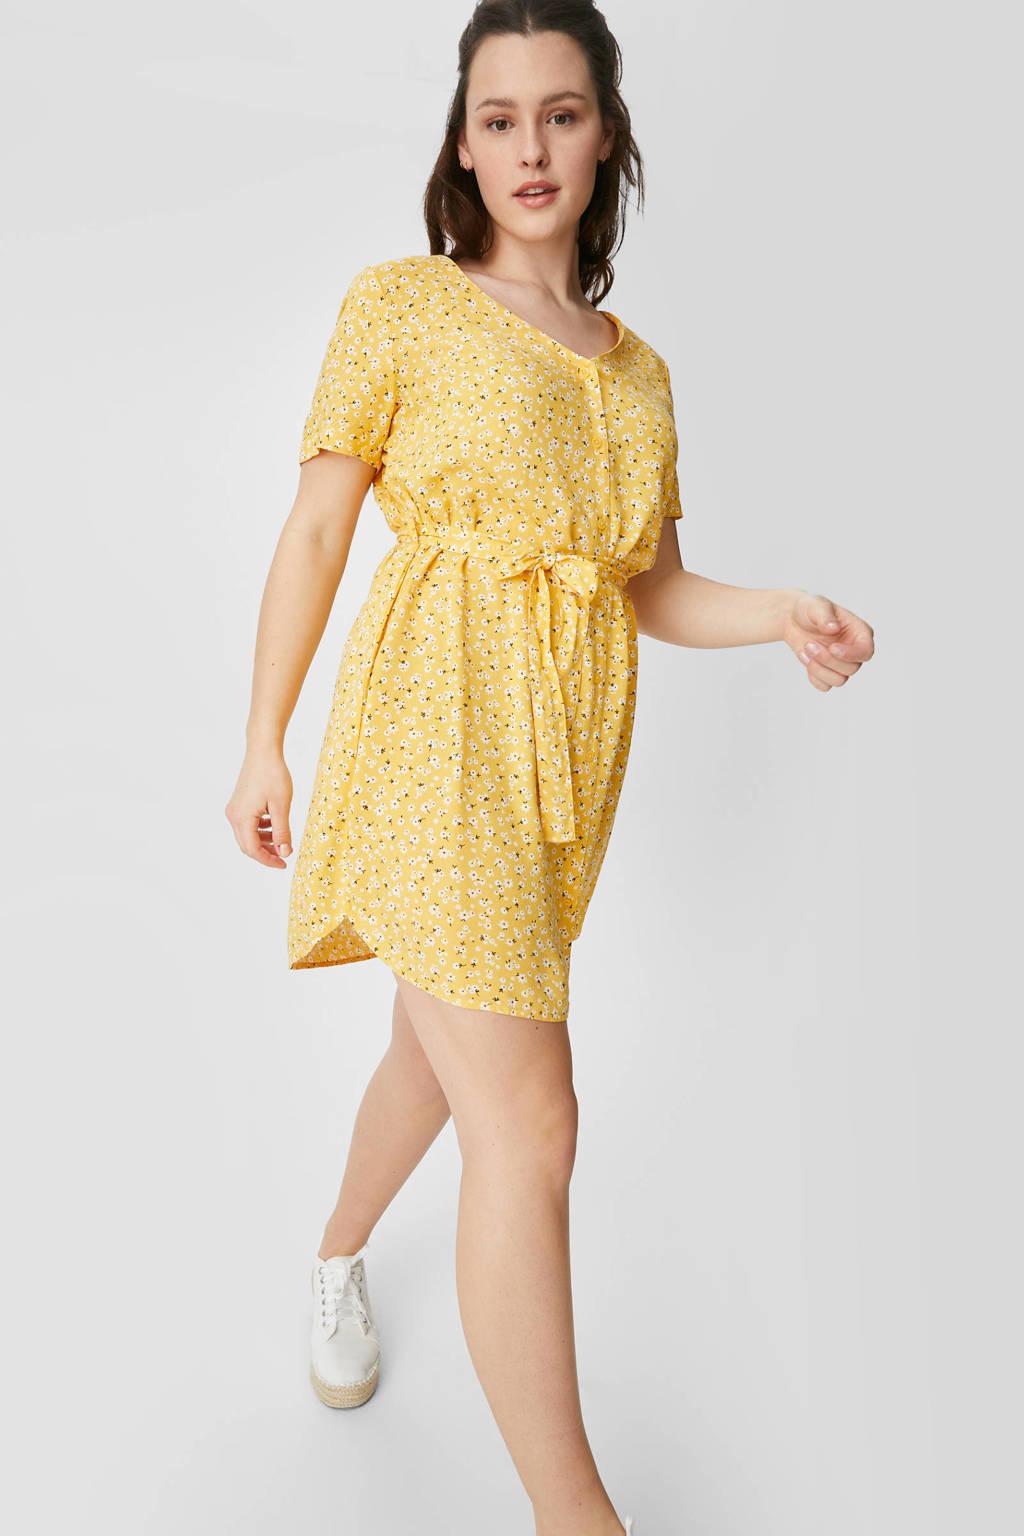 C&A XL Clockhouse gebloemde jurk geel, Geel